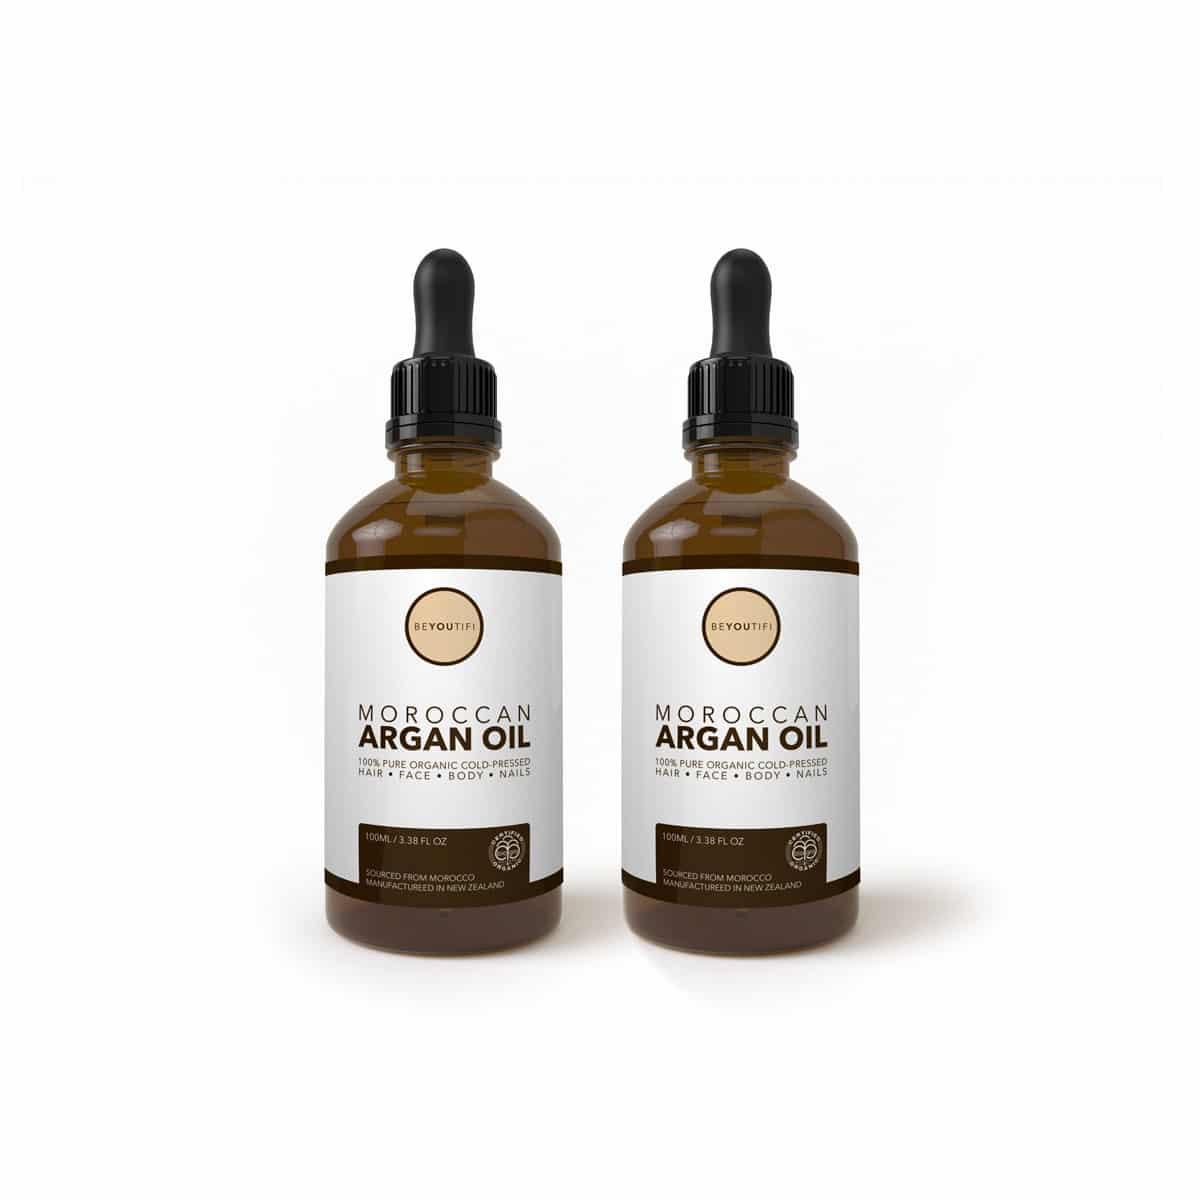 Argan Oil Reviews For Natural Hair